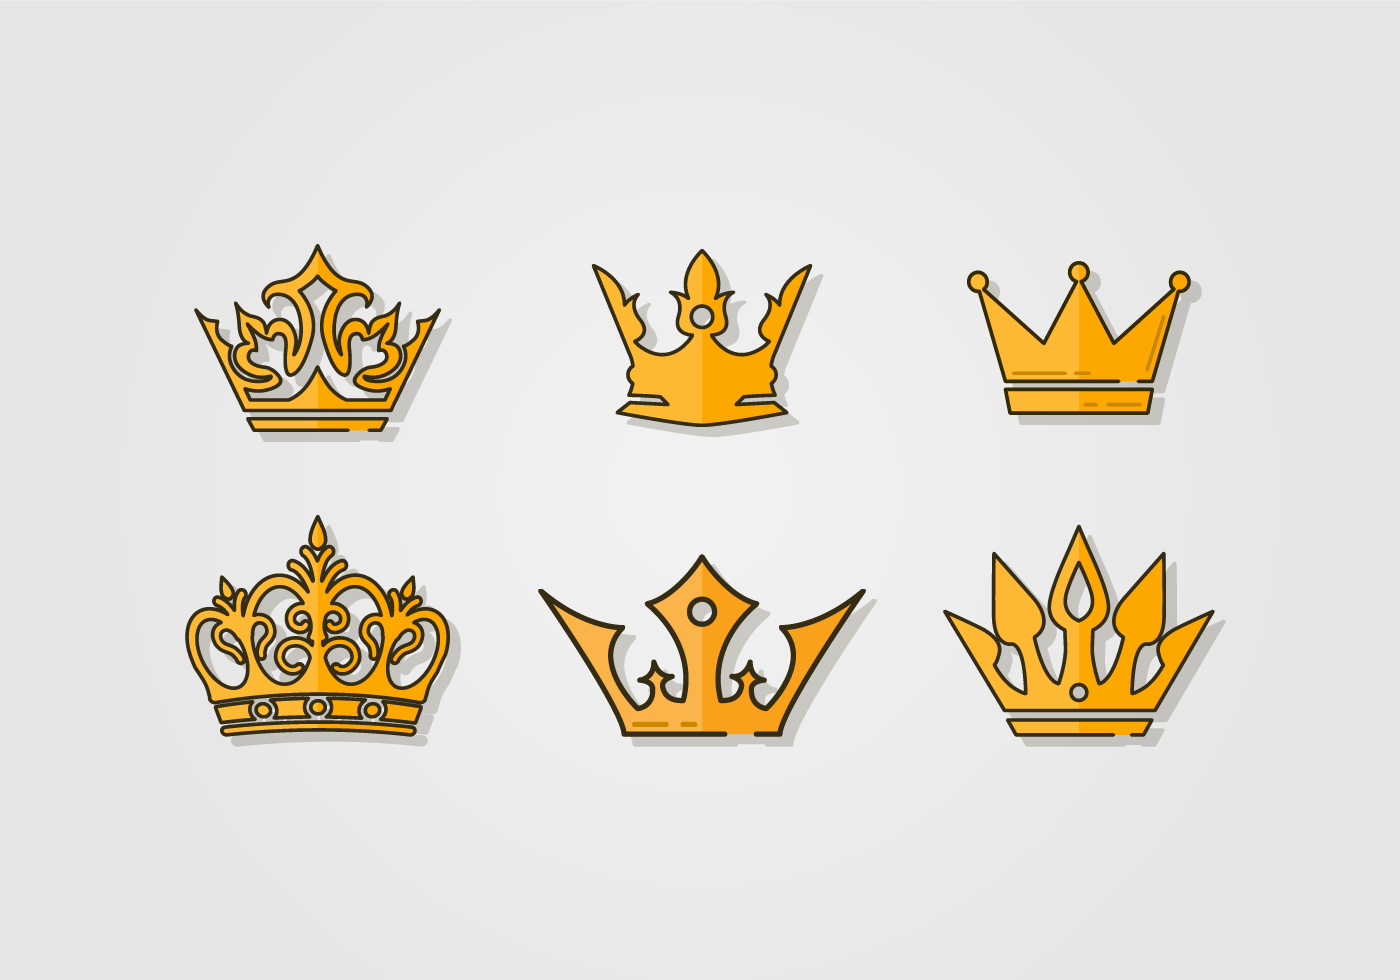 Картинки корон с надписью элита